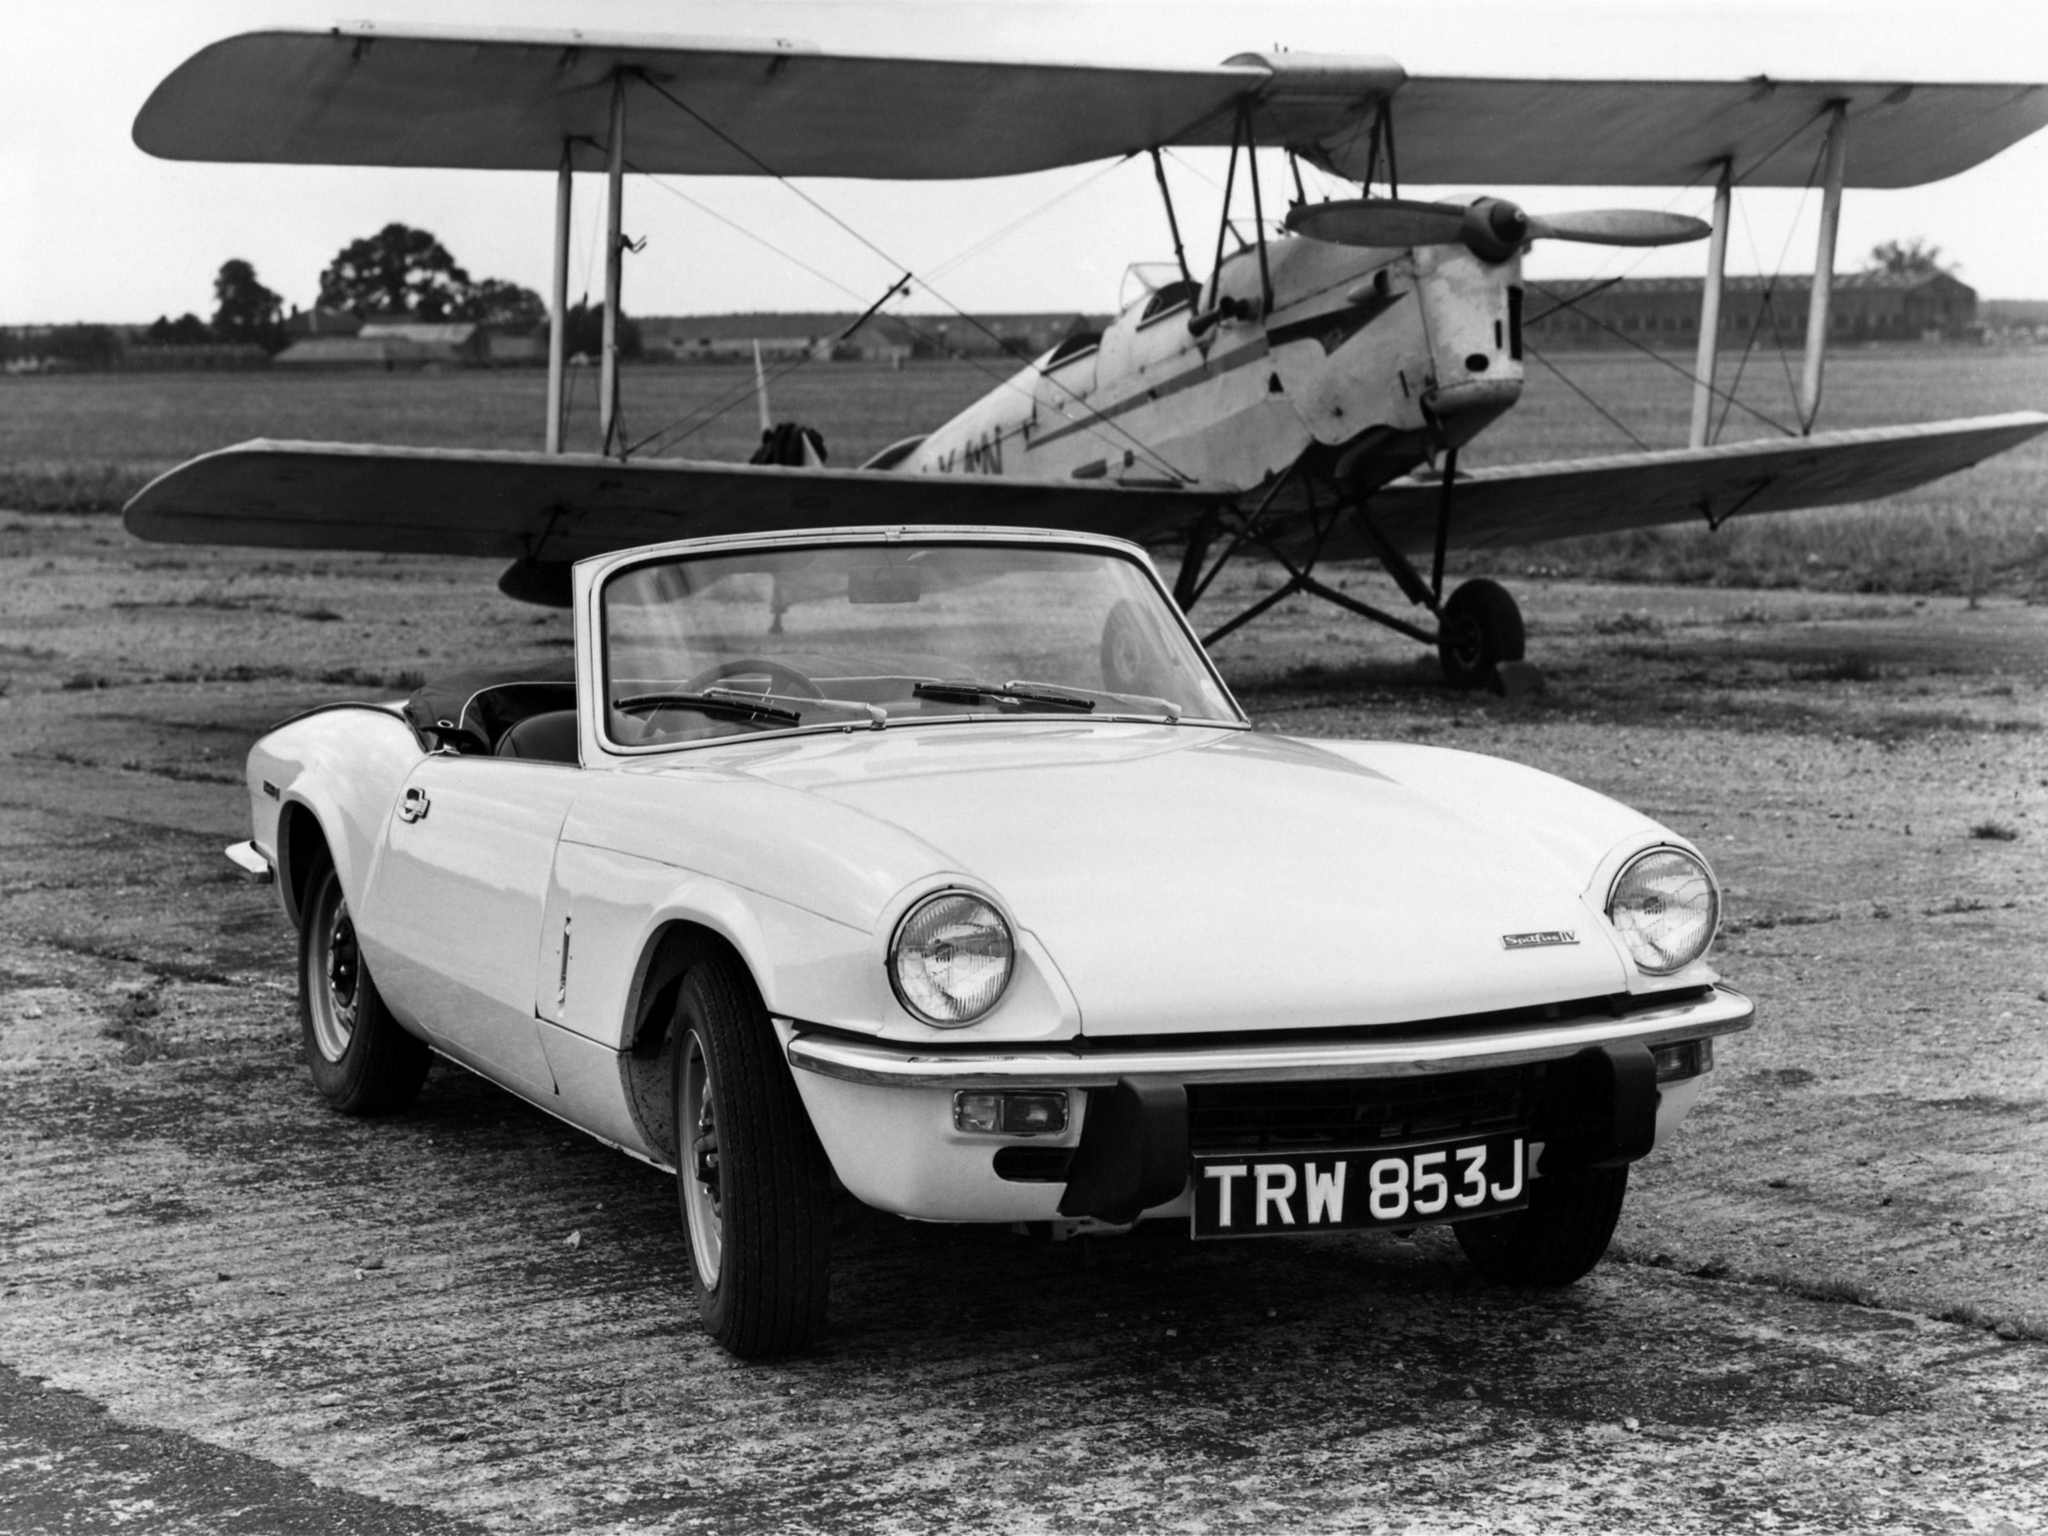 1970 Triumph Spitfire MkIV classic g wallpaper 2048x1536 187711 2048x1536